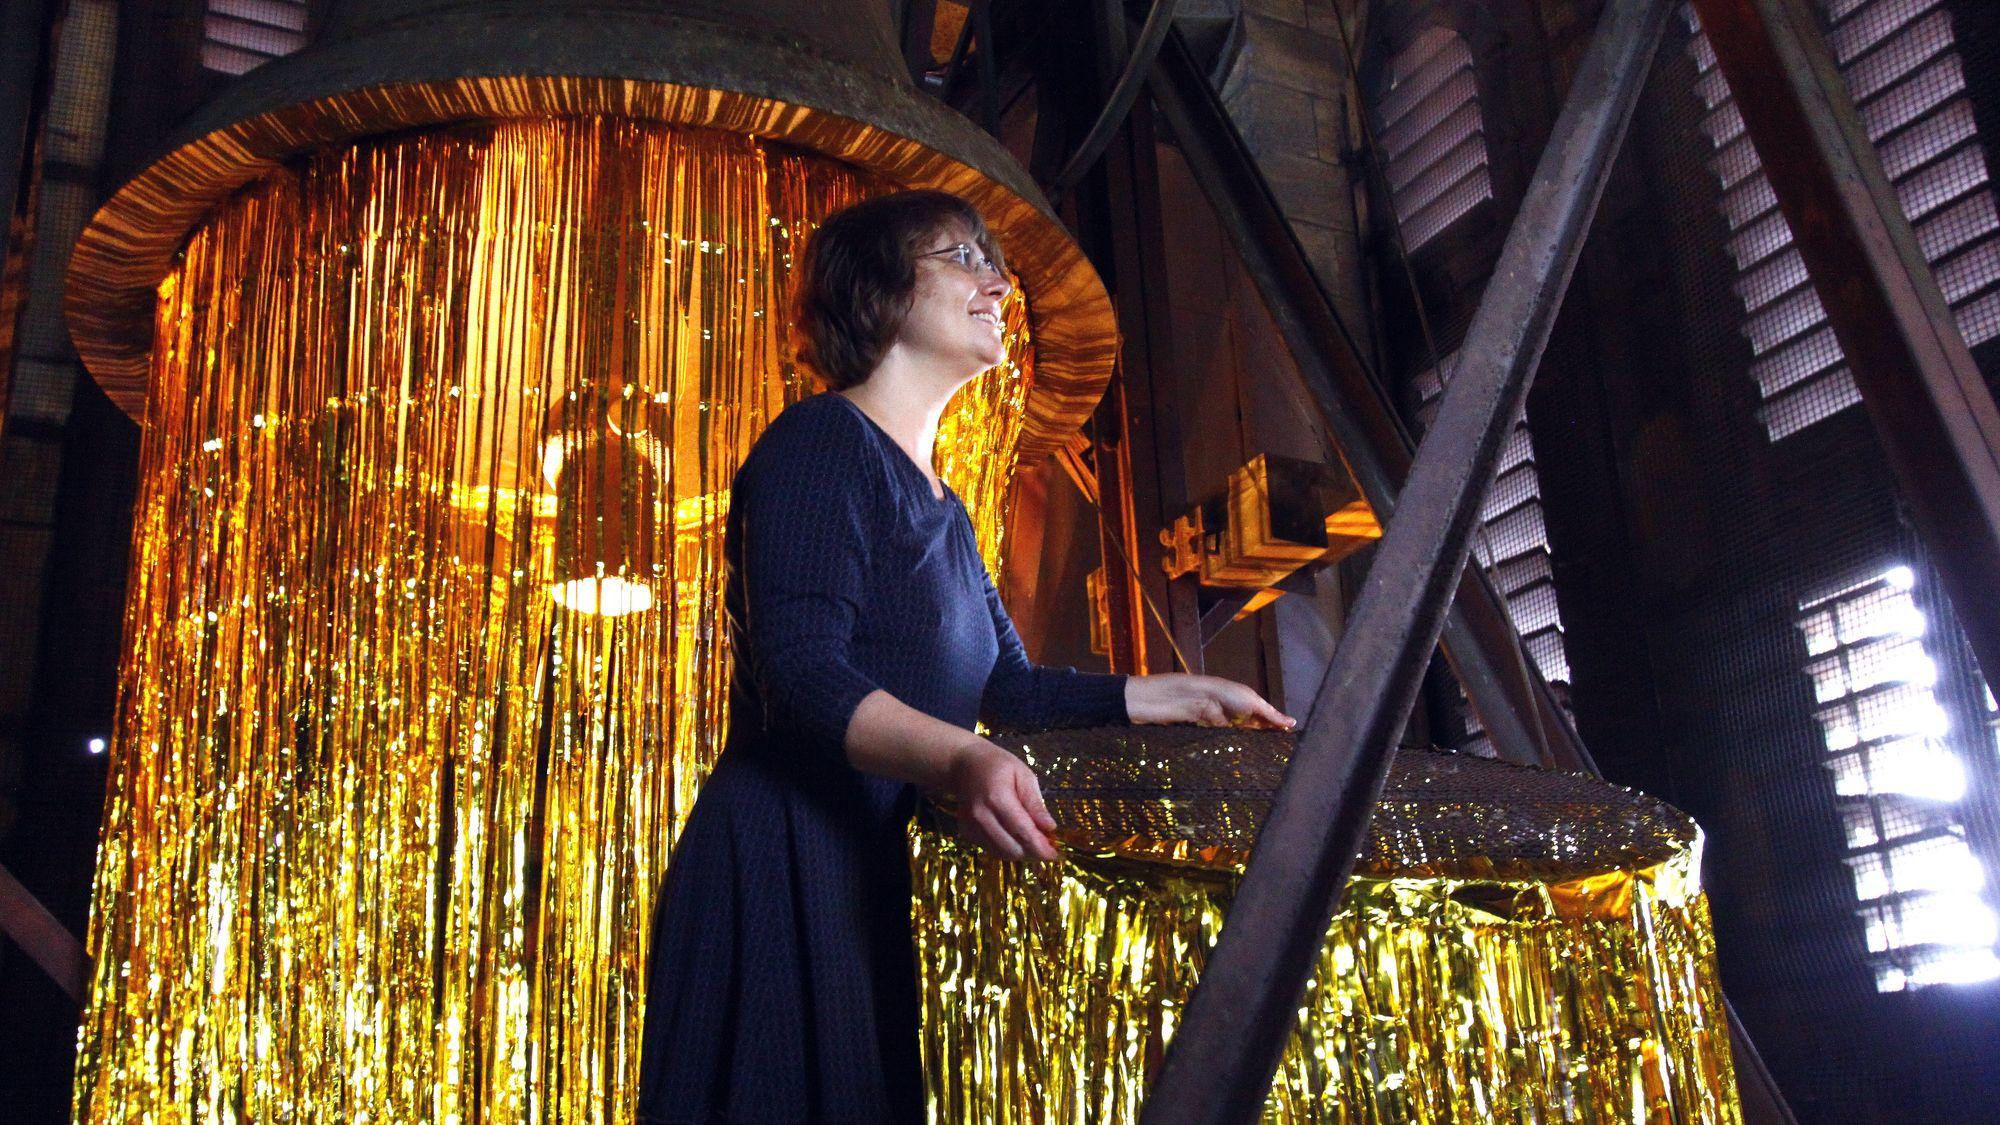 Marí Emily Bohley während der Kunstperformance Ornö 2015 – Foto: Archiv/Youssef Safwan